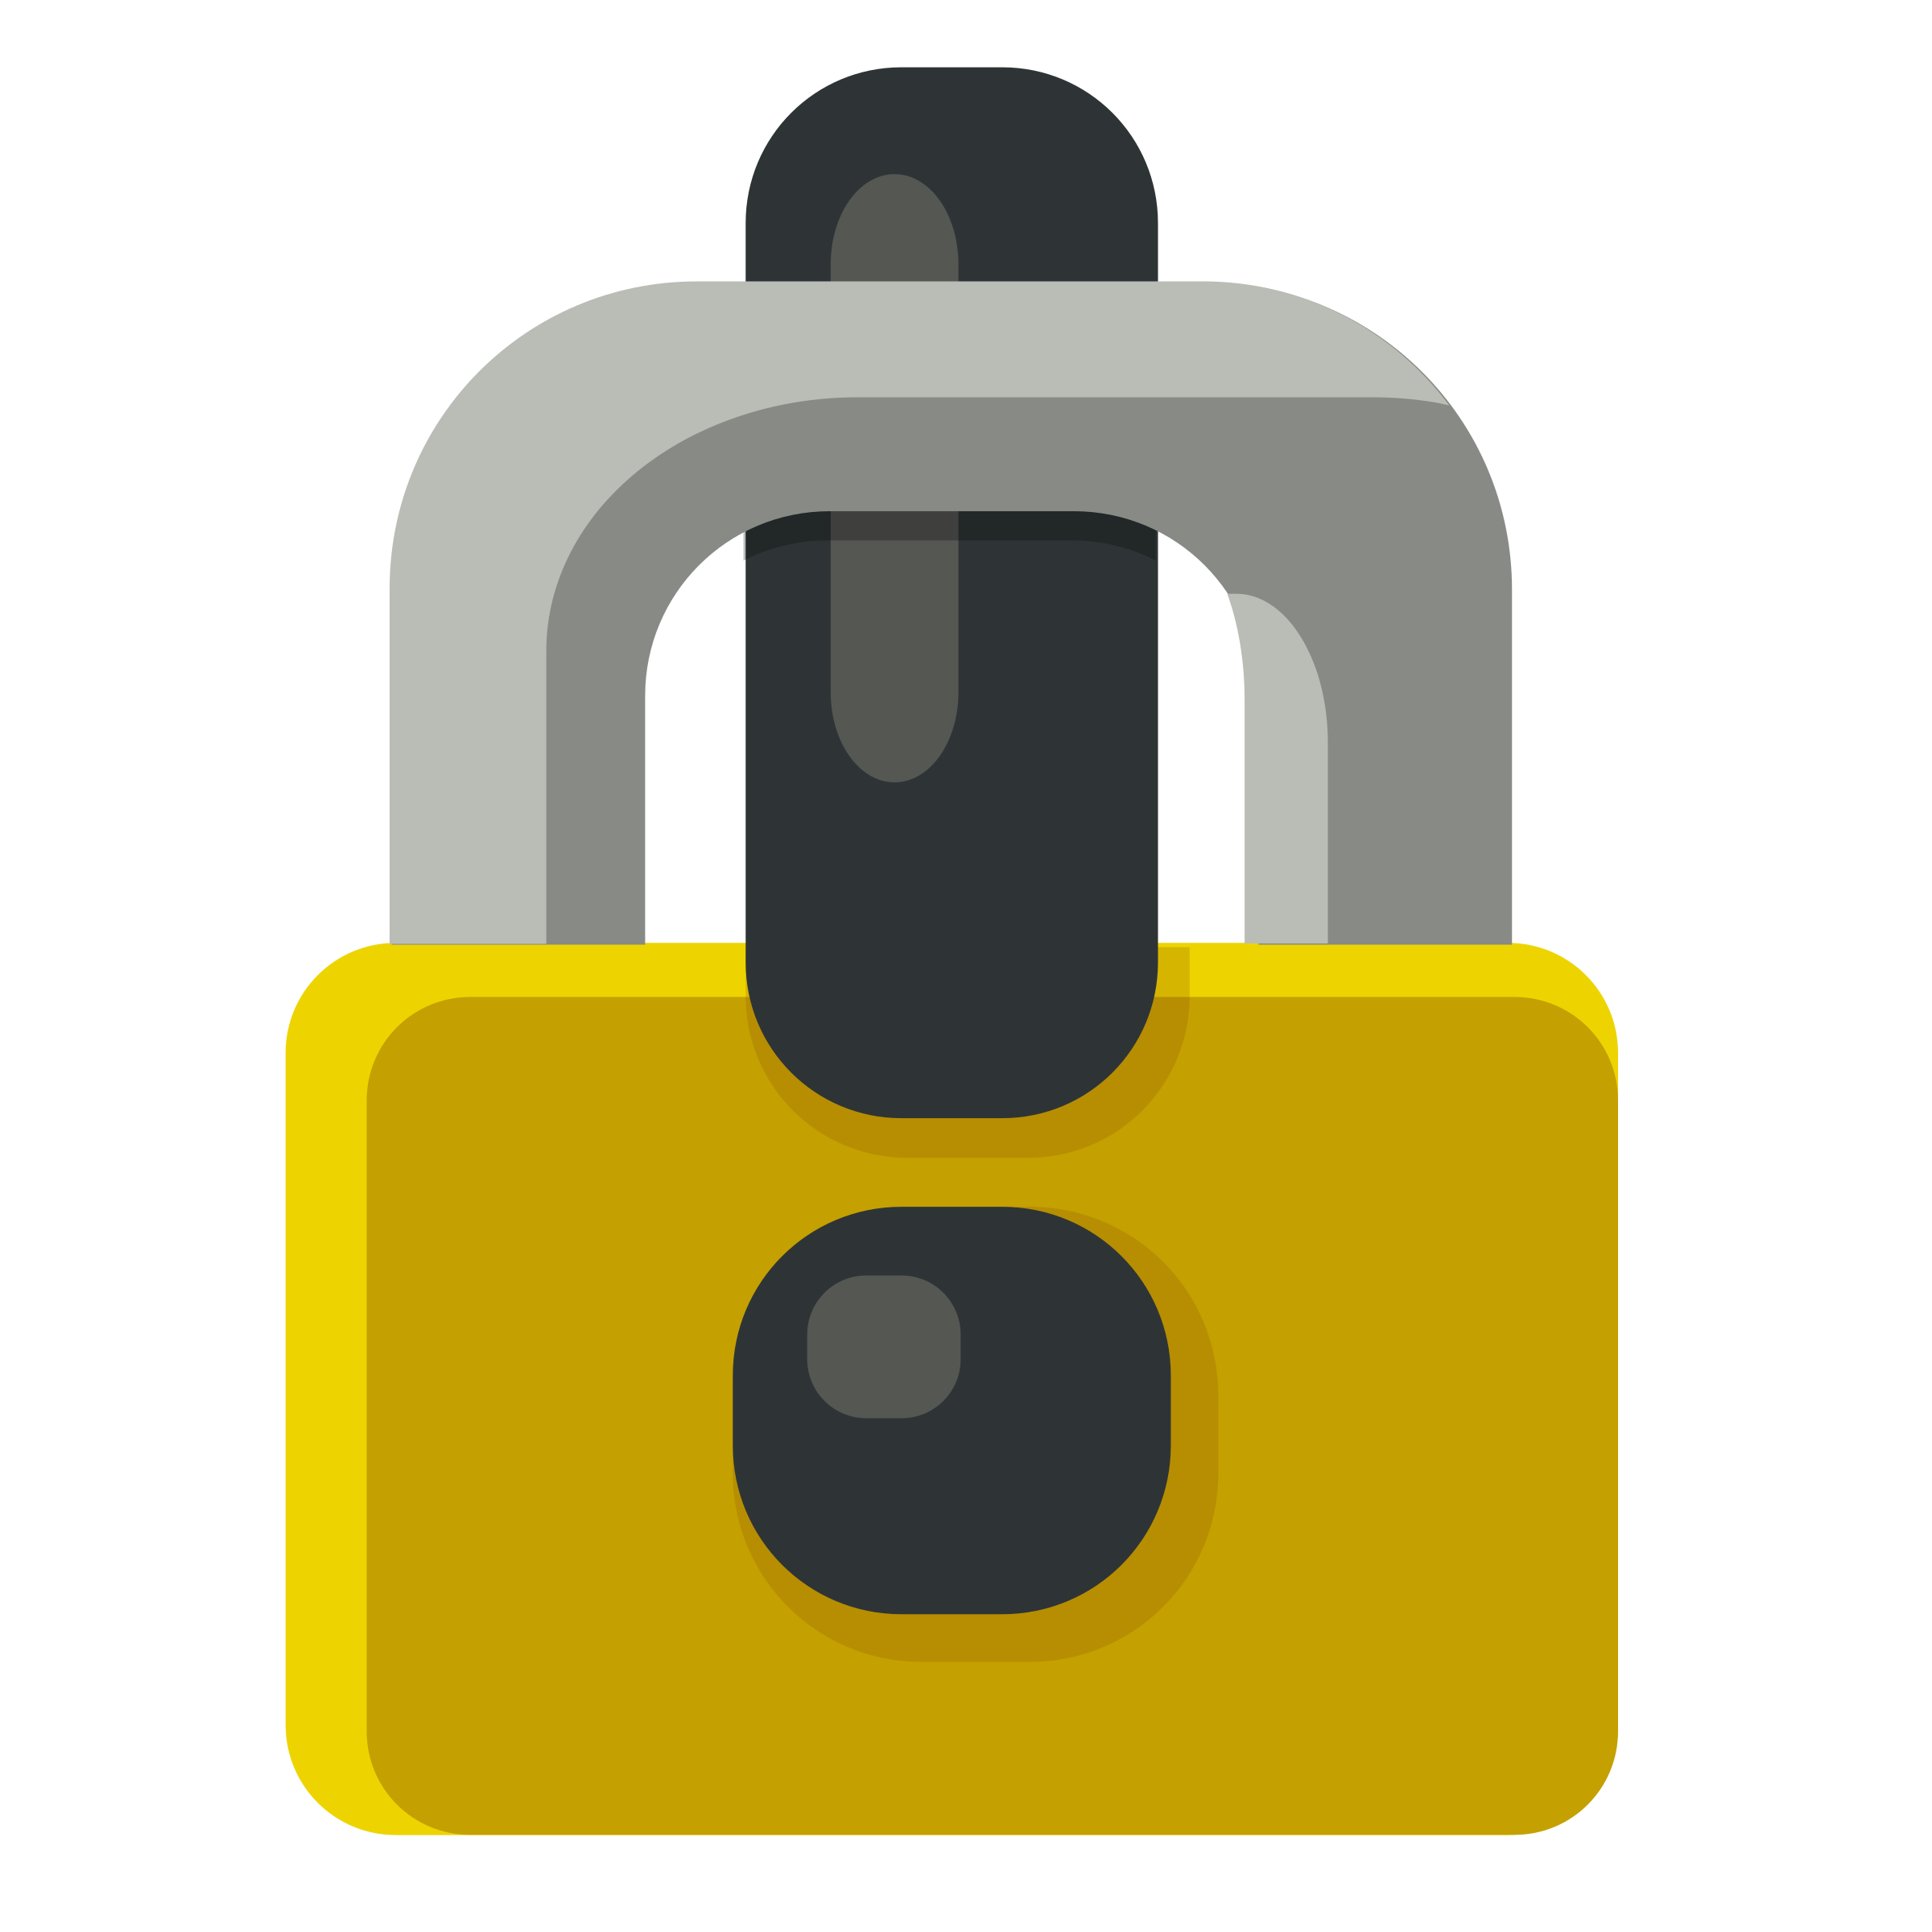 Lock clipart locked. Exclamation mark padlock icons